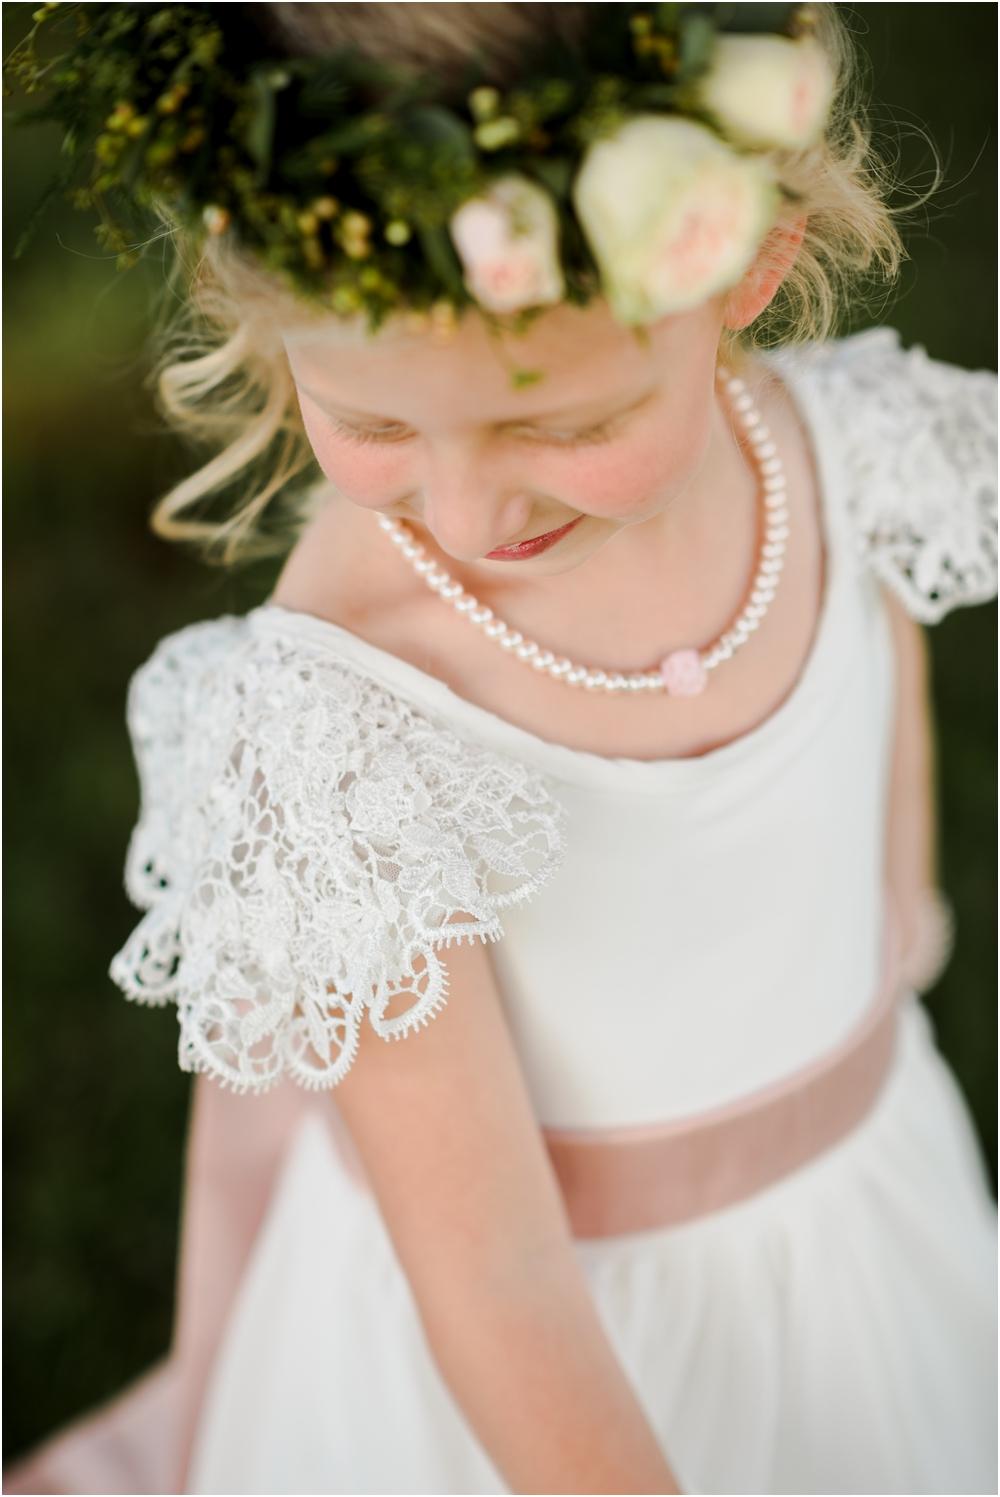 marianna-florida-wedding-photographer-kiersten-grant-91.jpg